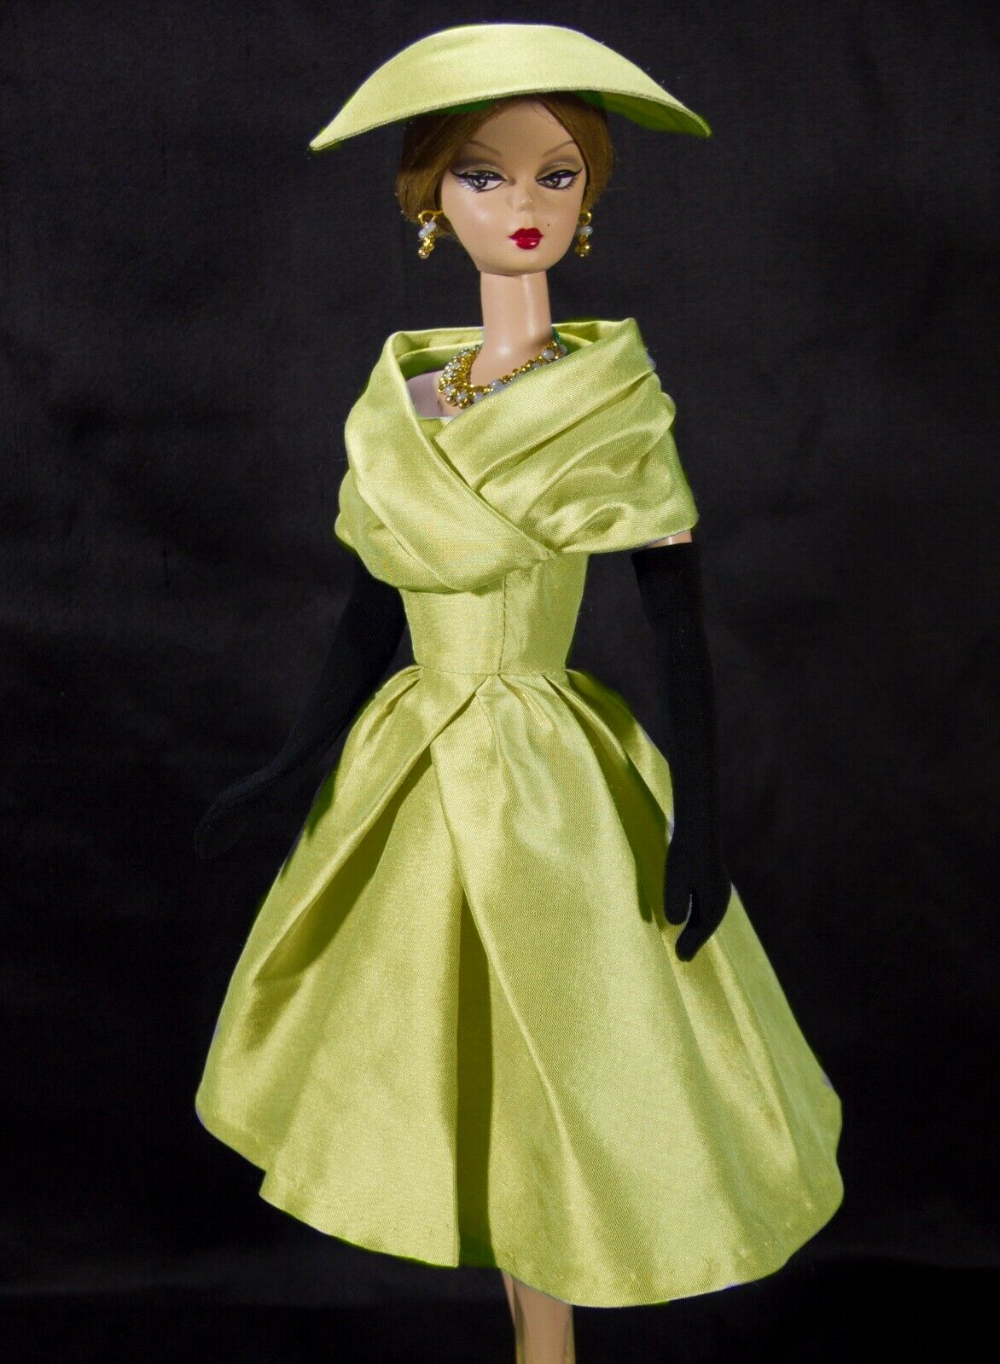 Dress On Demand Ooak Outfit Fits To Vintage Silkstone Barbie By D B Ebay In 2020 Diy Barbie Clothes Barbie Vintage Dolls